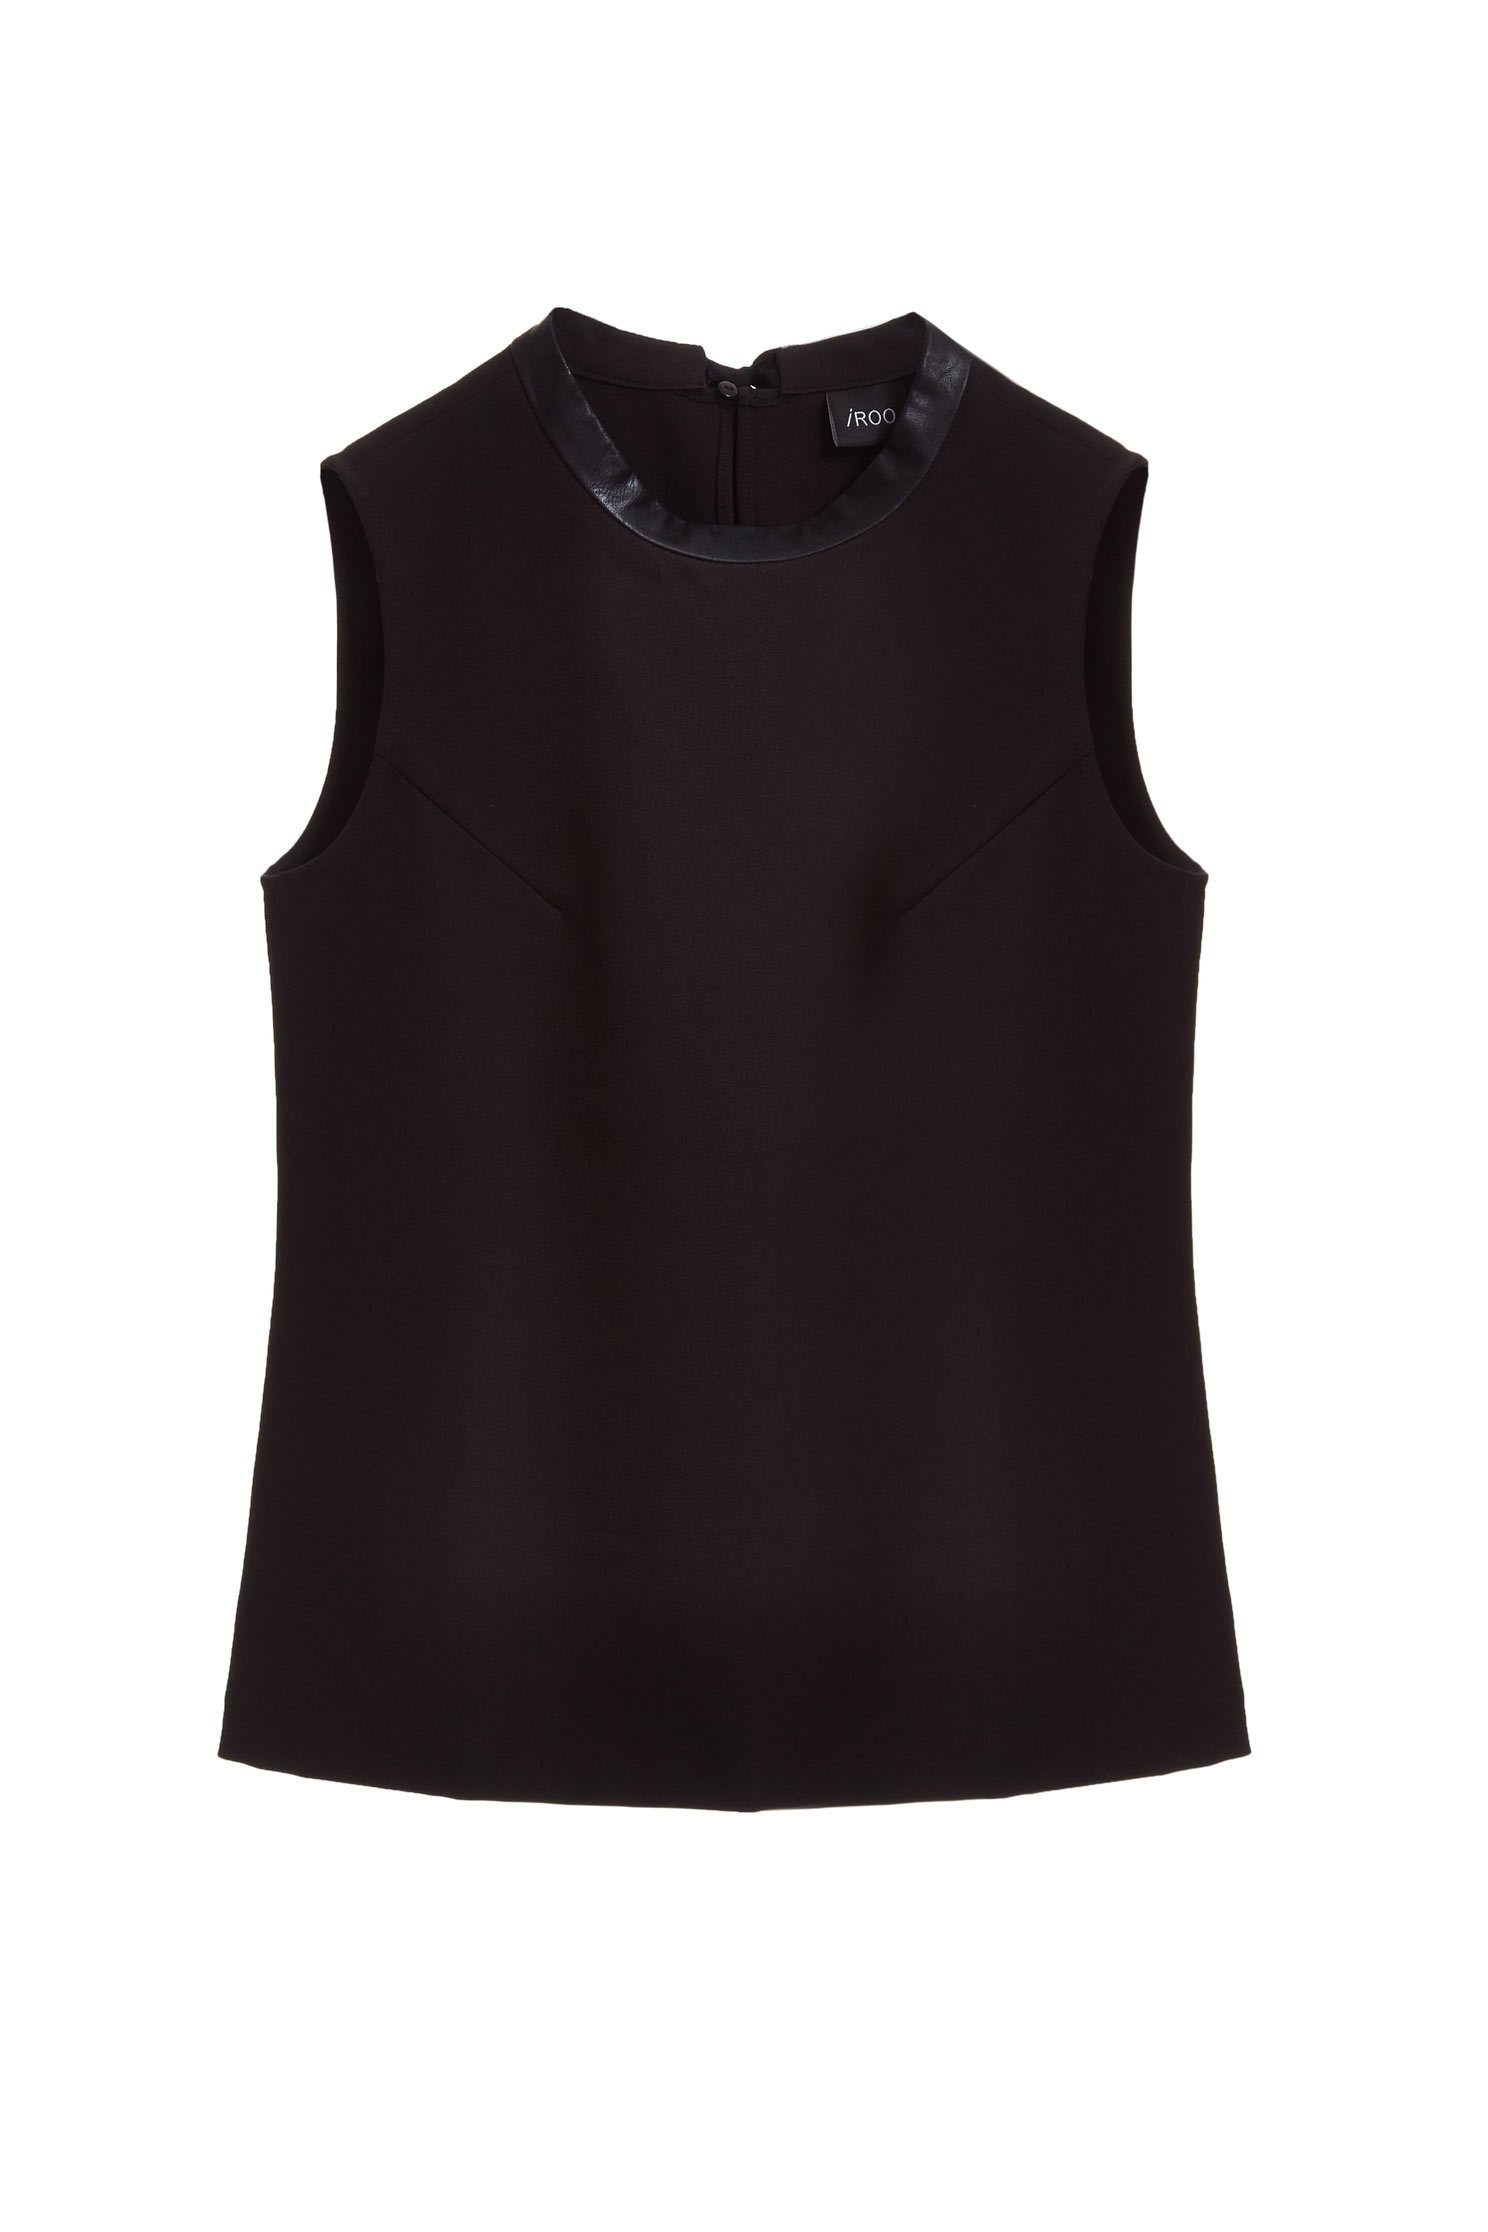 Classic fashion sleeveless vest,vest,vest,blackvest